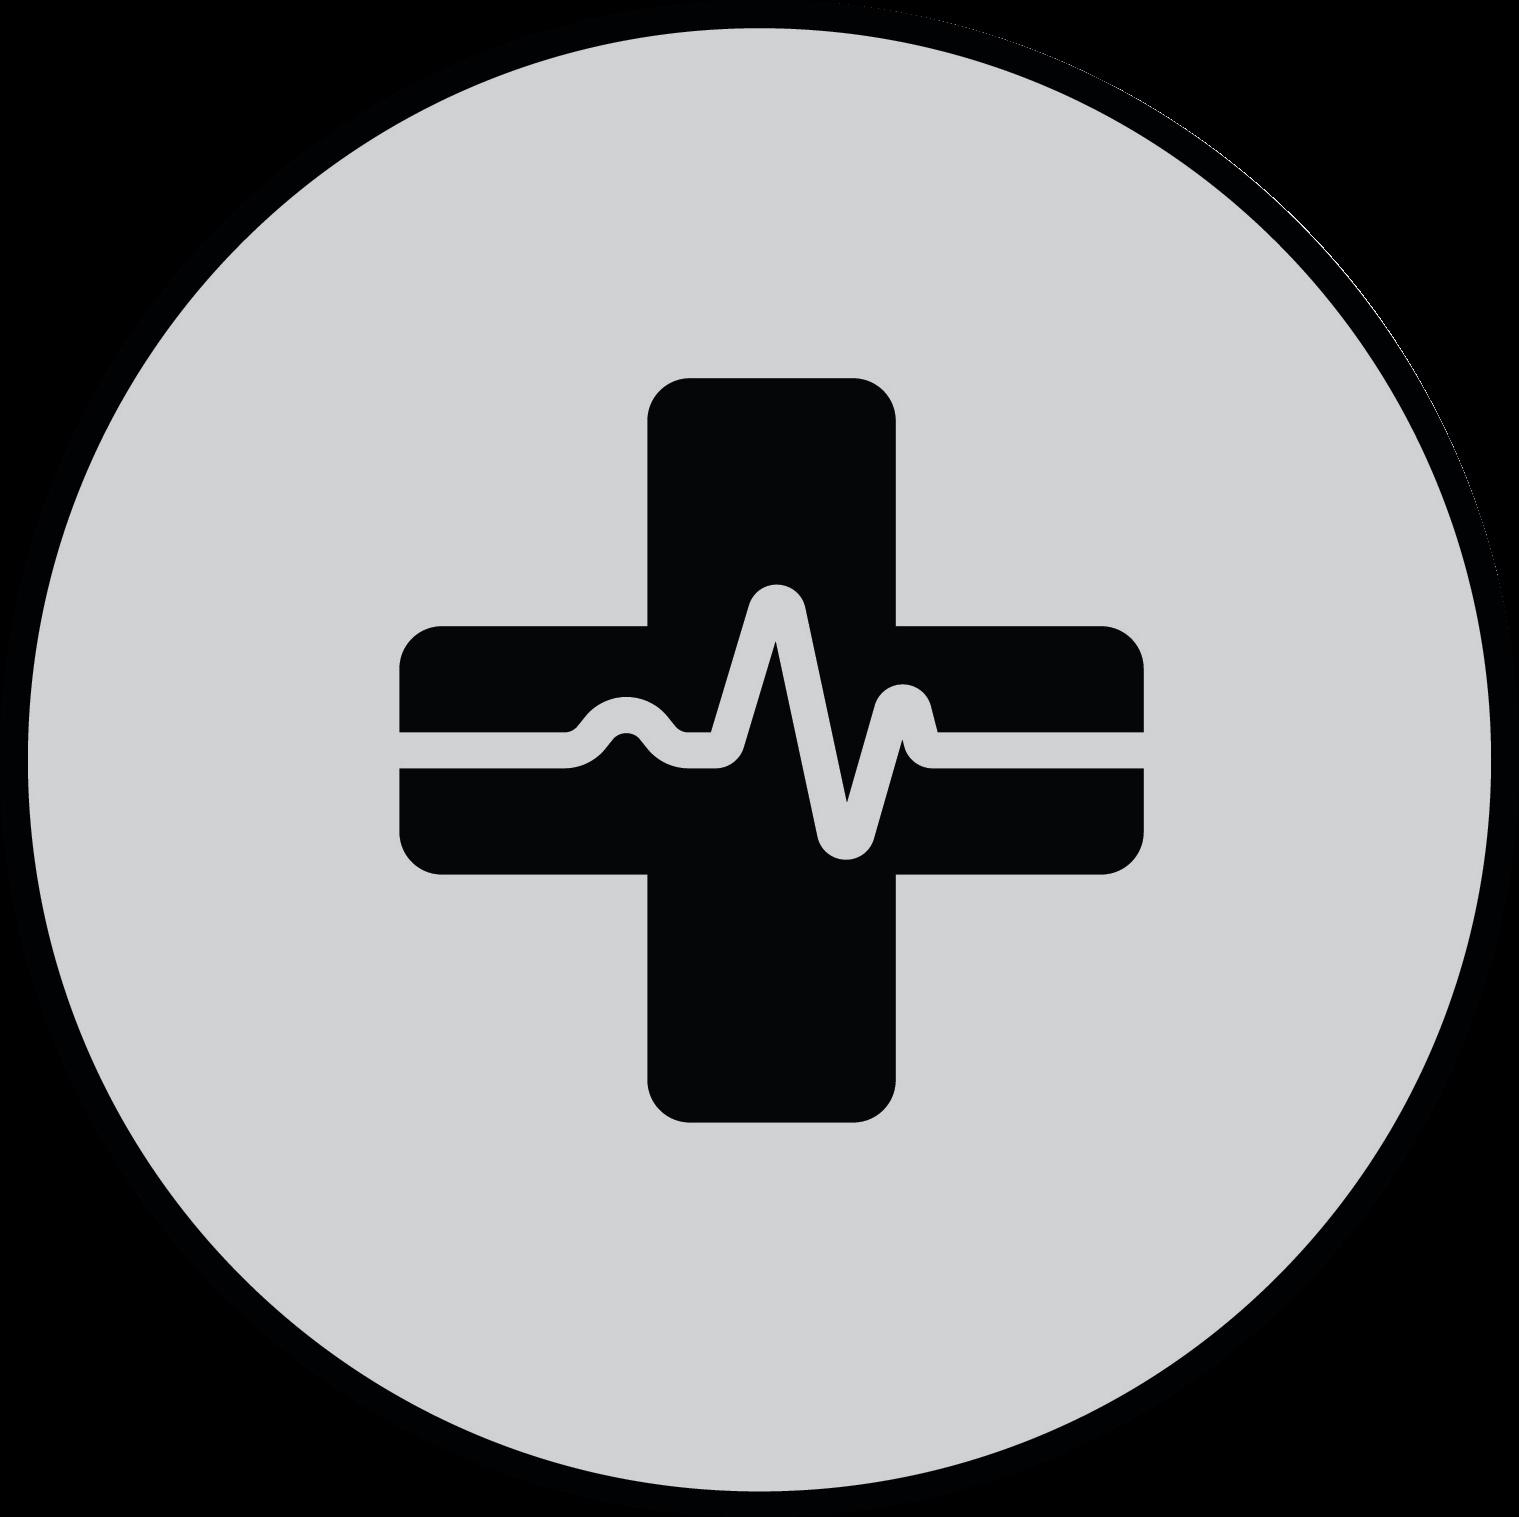 Benefits and Perks Circle Graphic